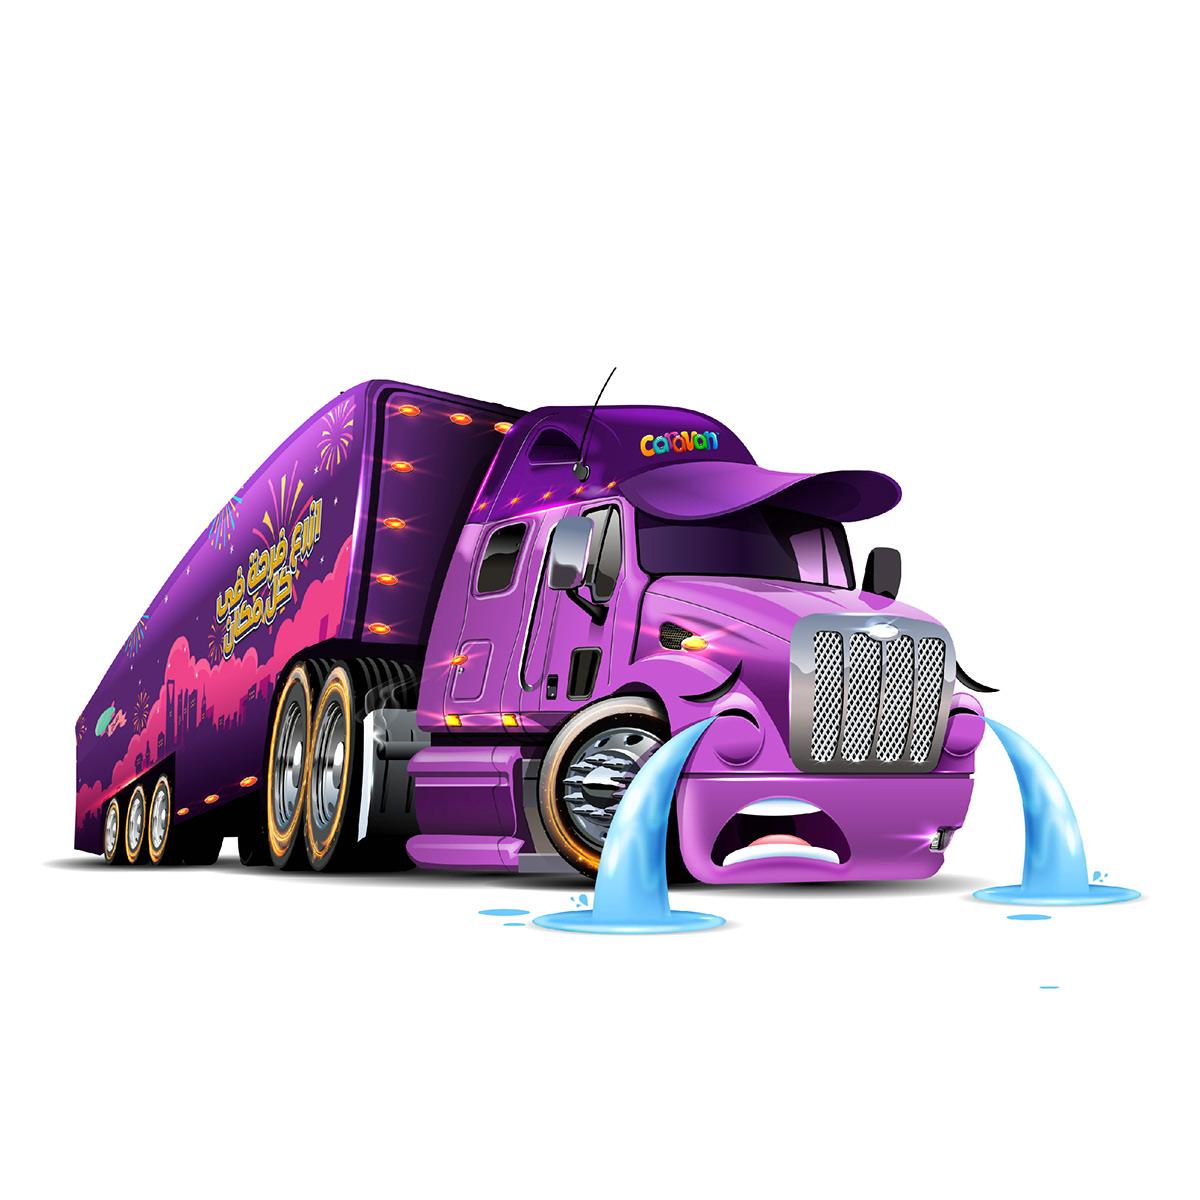 Image may contain: cartoon, vehicle and land vehicle